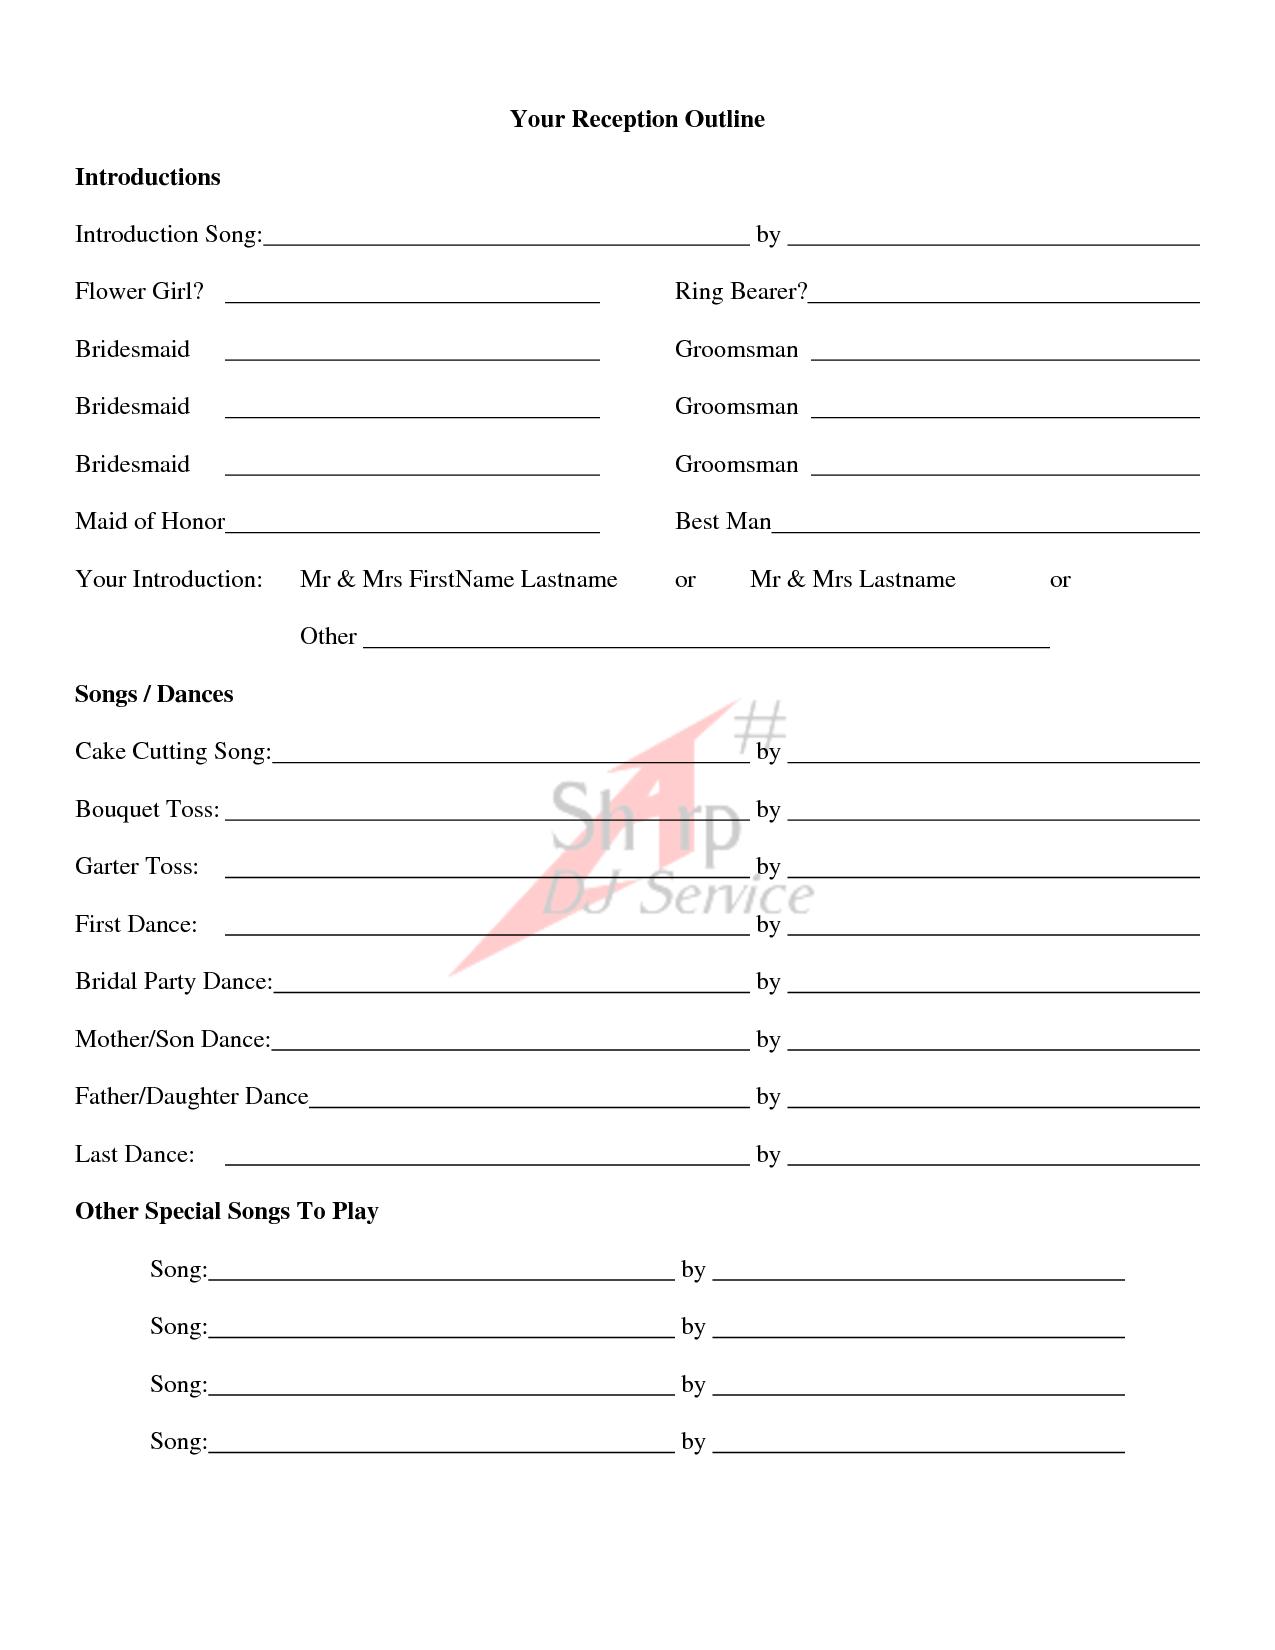 Wedding Ceremony Outline Examples